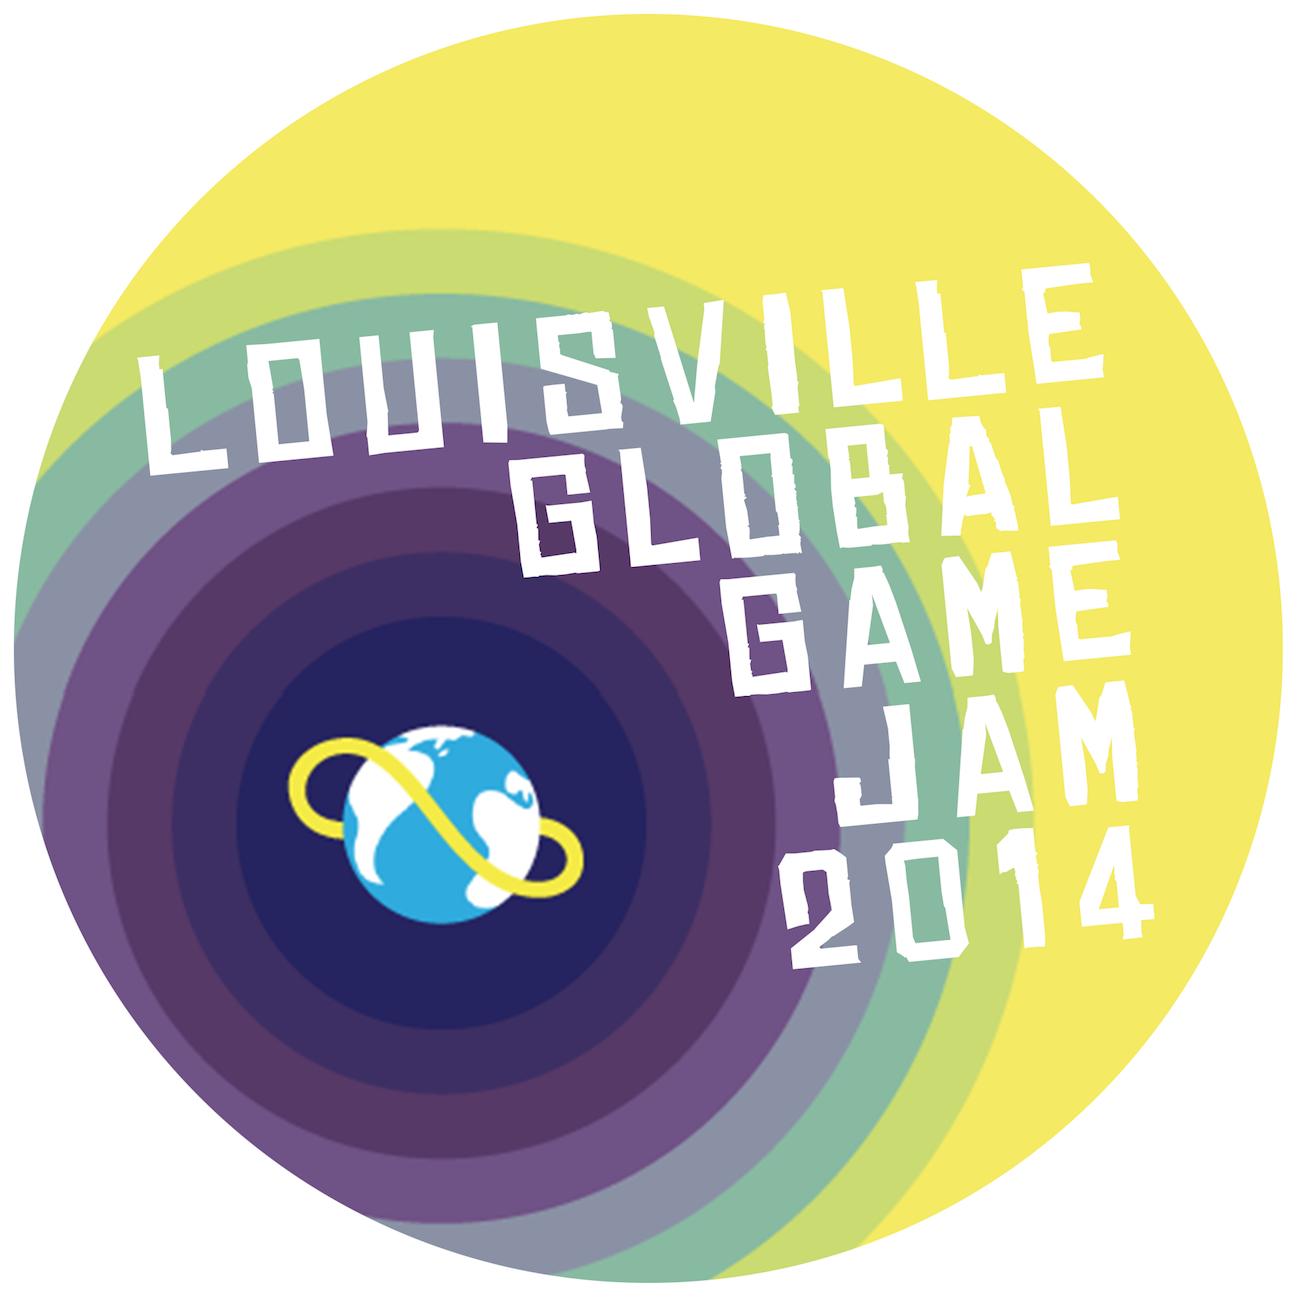 Louisville Global game Jam 2014 louisvilleglobalgamejam.github.io